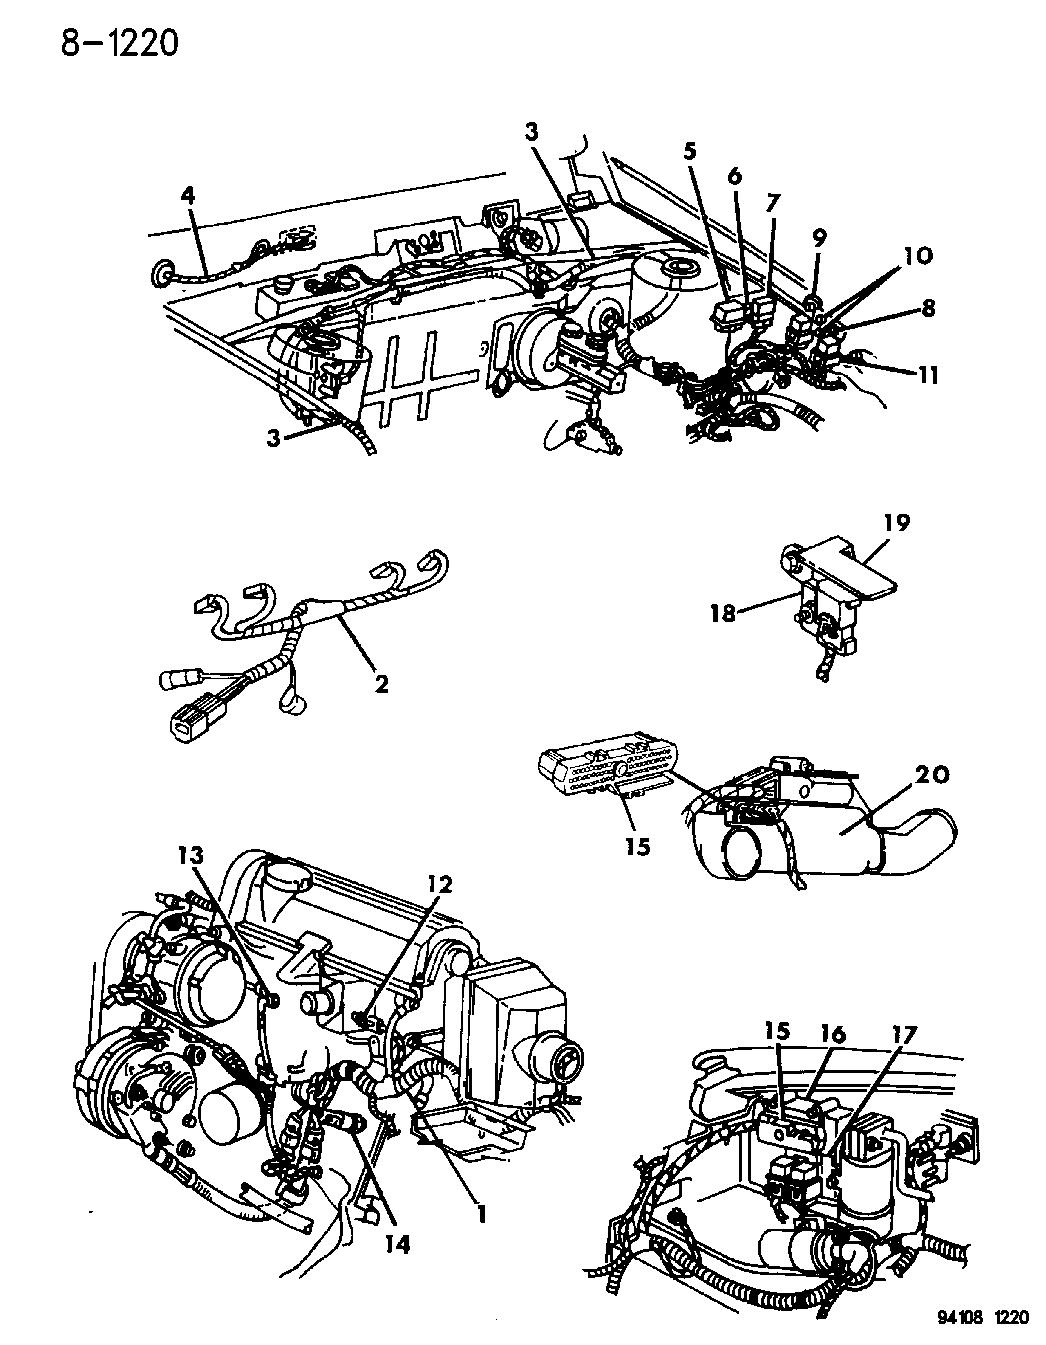 1994 Chrysler Lebaron Sedan Wiring Engine Related Parts 94 Diagram